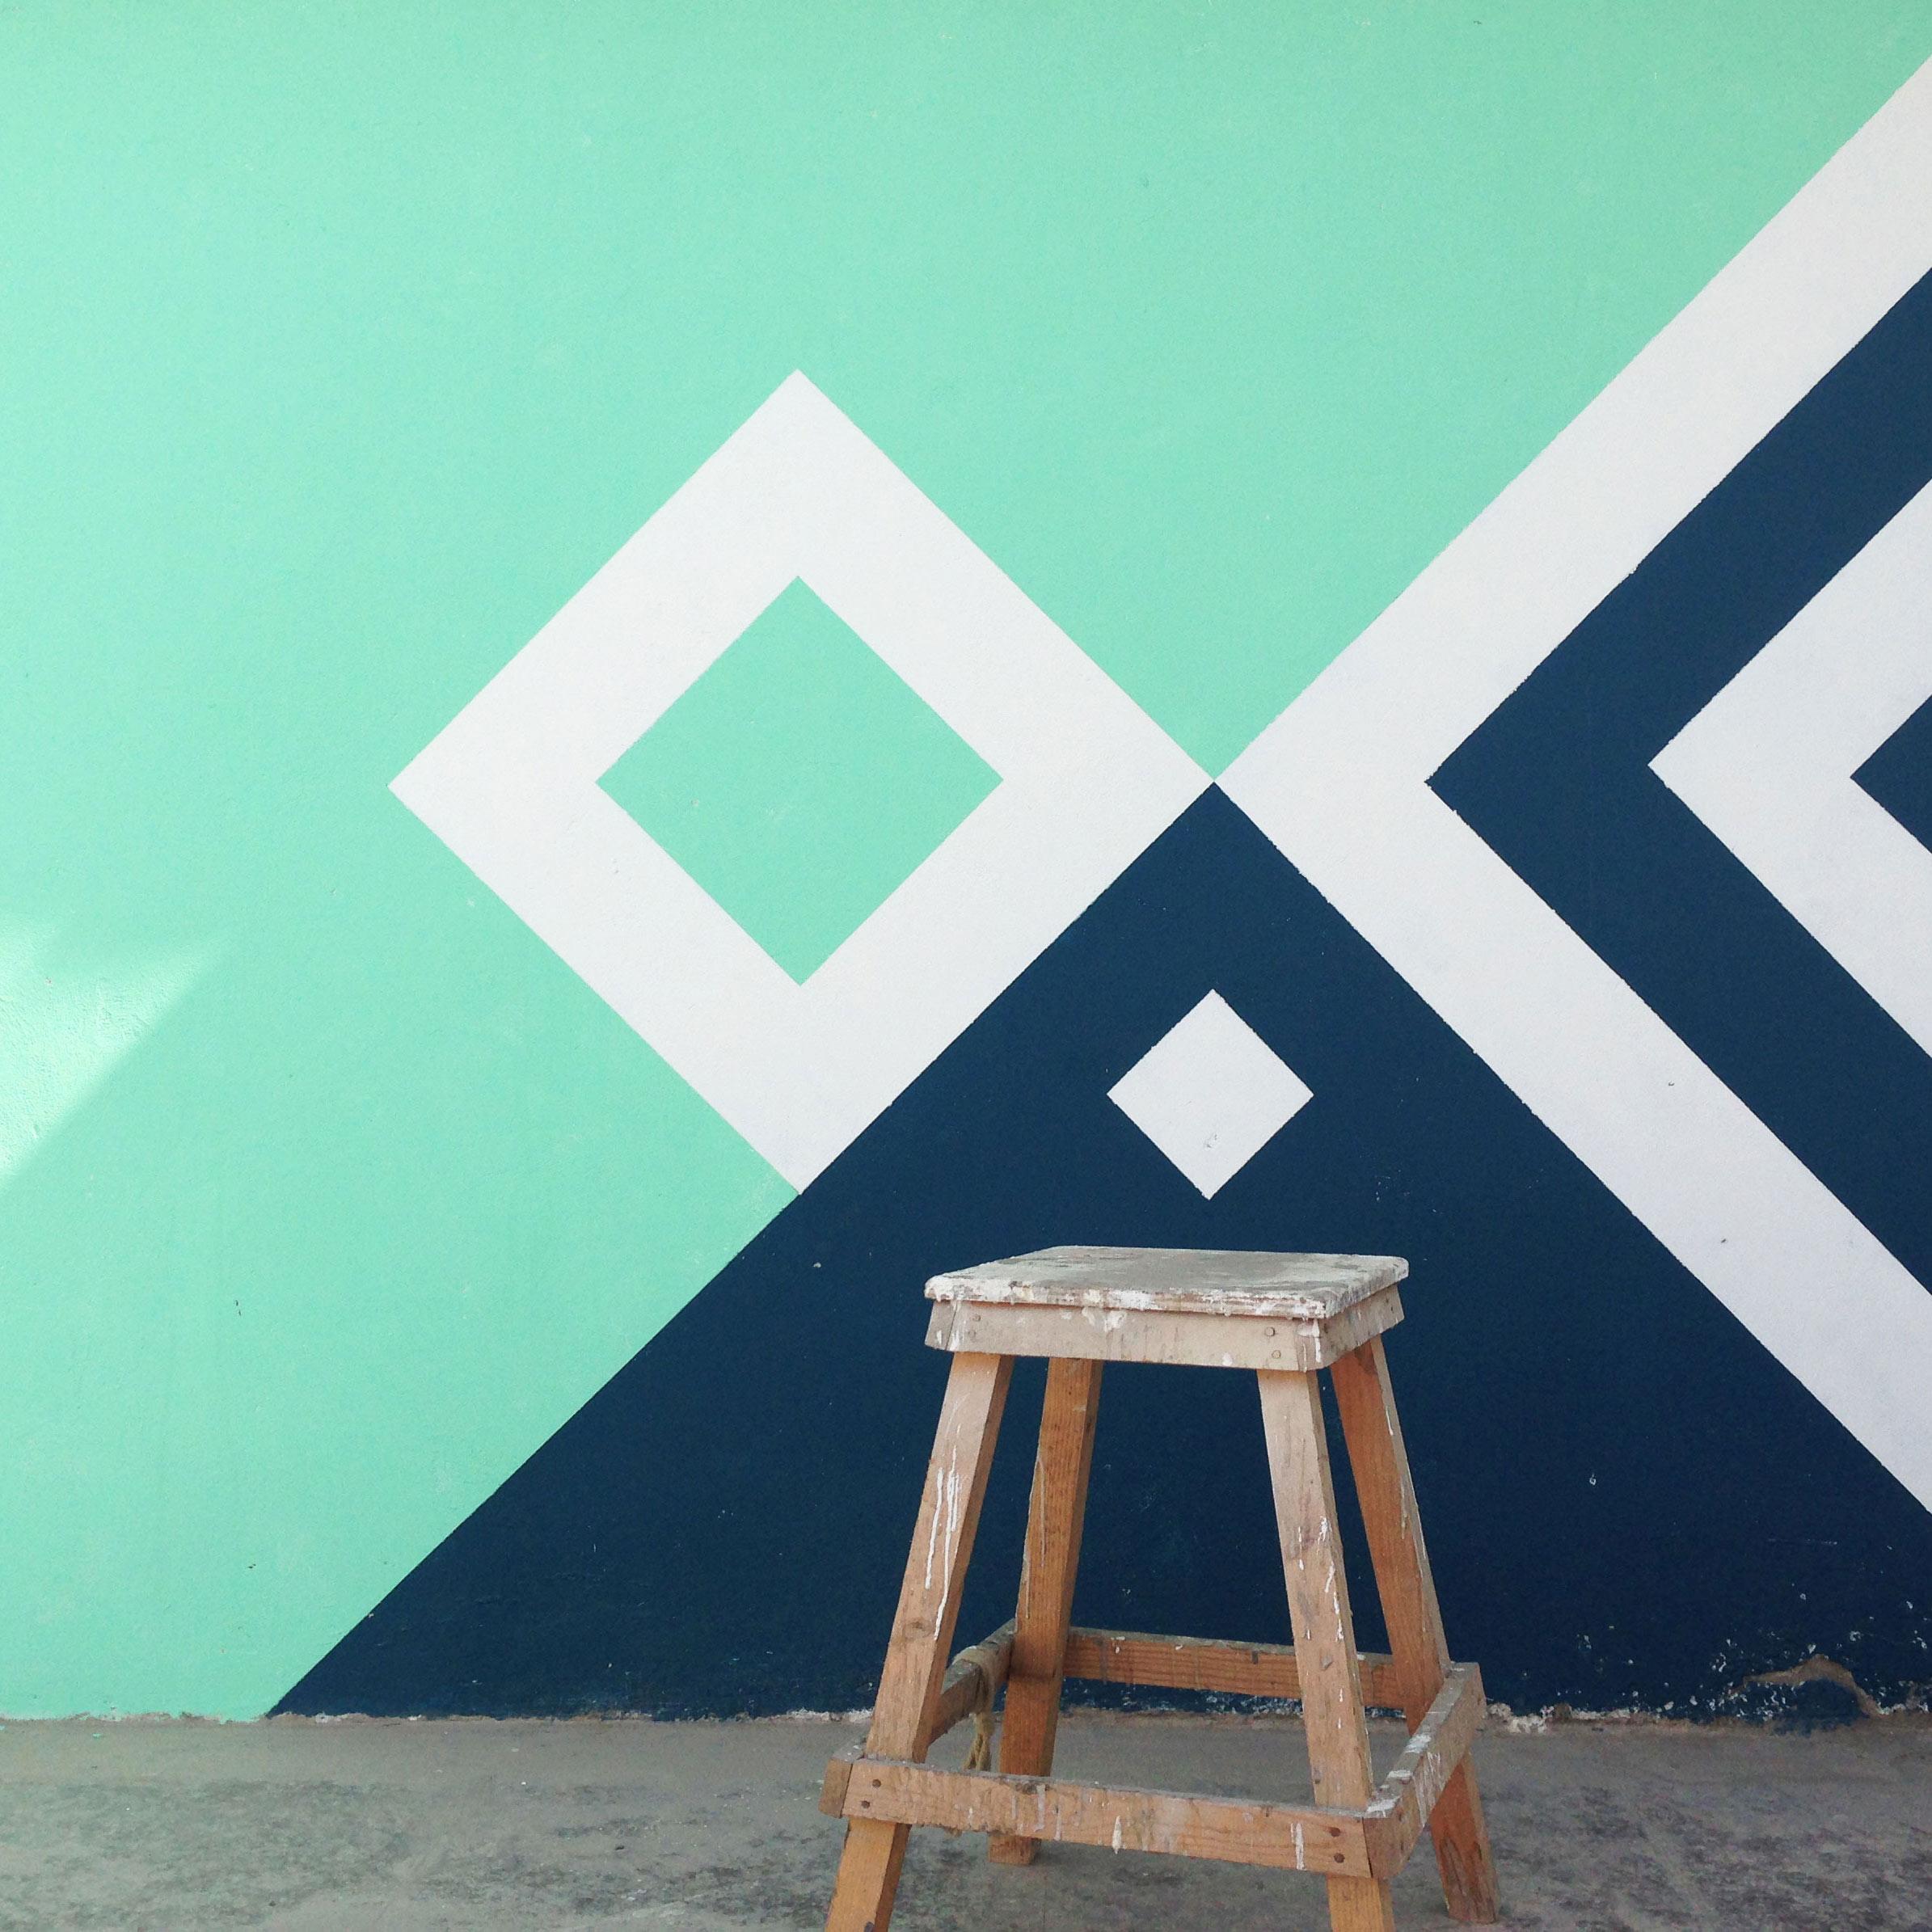 Bray-atelier-mural-peinture-thumb.jpg